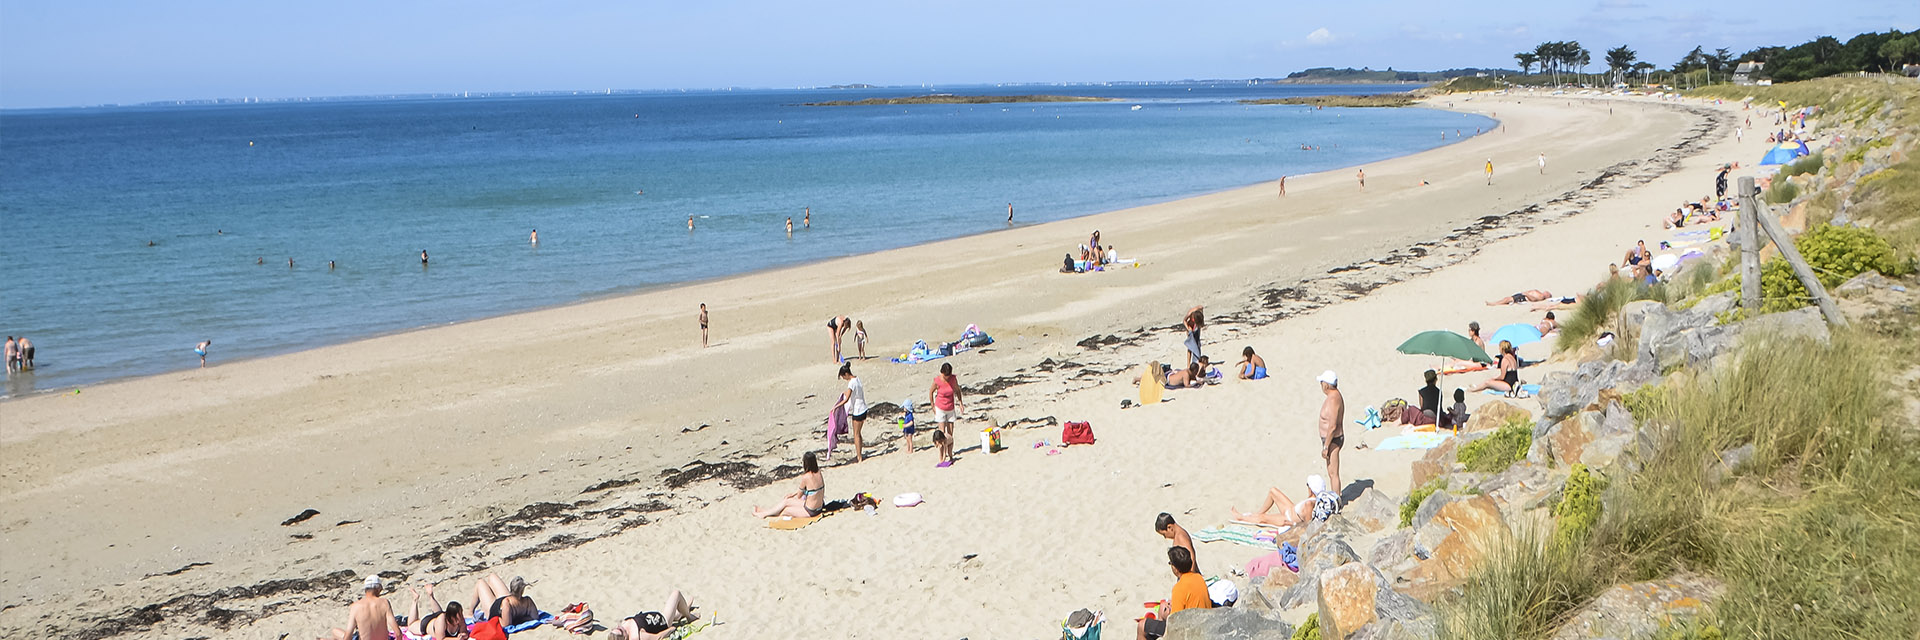 Village_club_vacances_bretagne-sud-la-pierre-bleue-plage